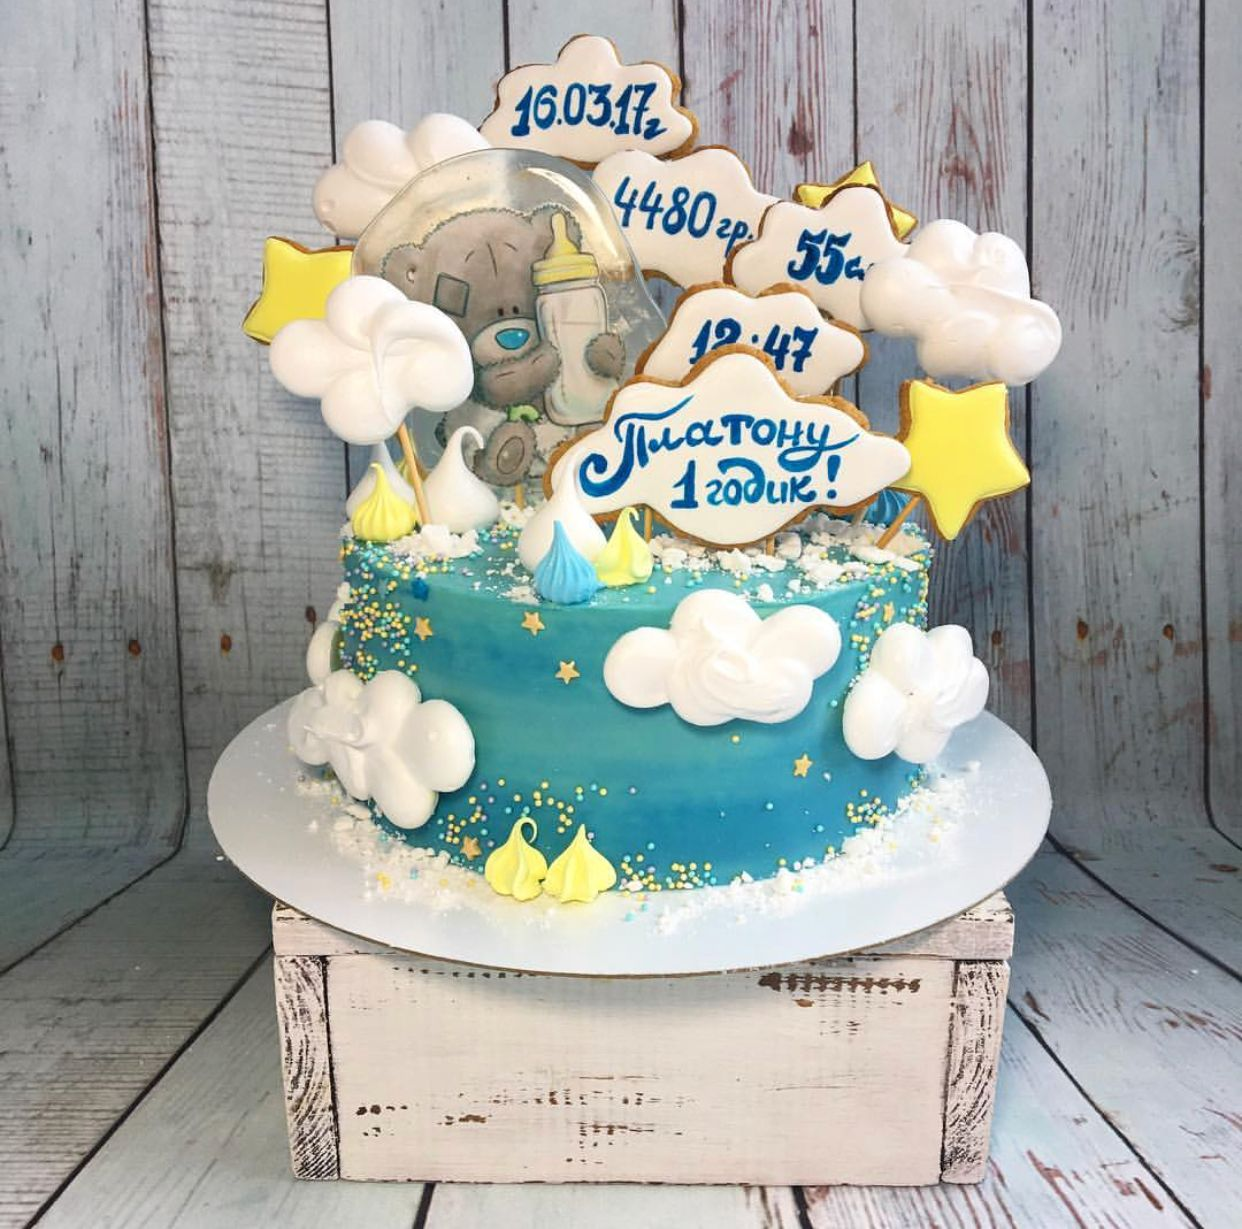 Торт голубой (синий) с облаками, с топперами, с звёздами ...